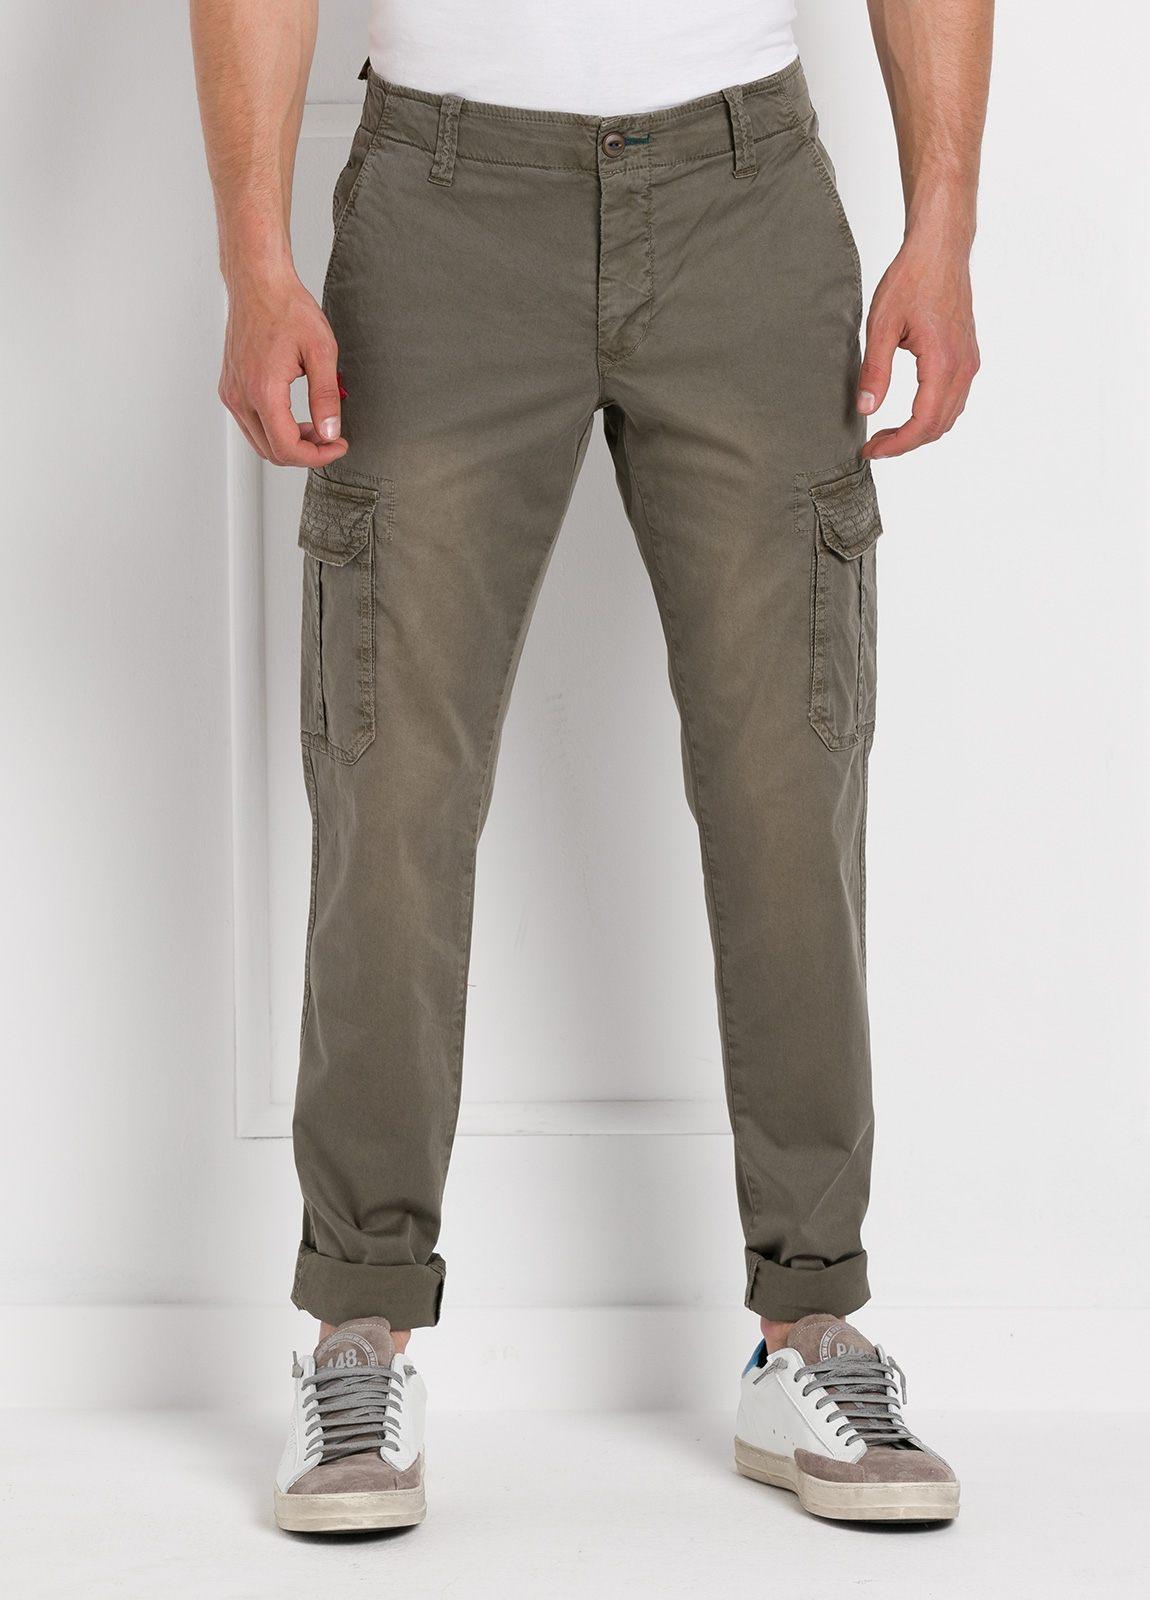 Pantalón sport modelo OLIVER color kaki con bolsillos laterales. Algodón gabardina vintage.